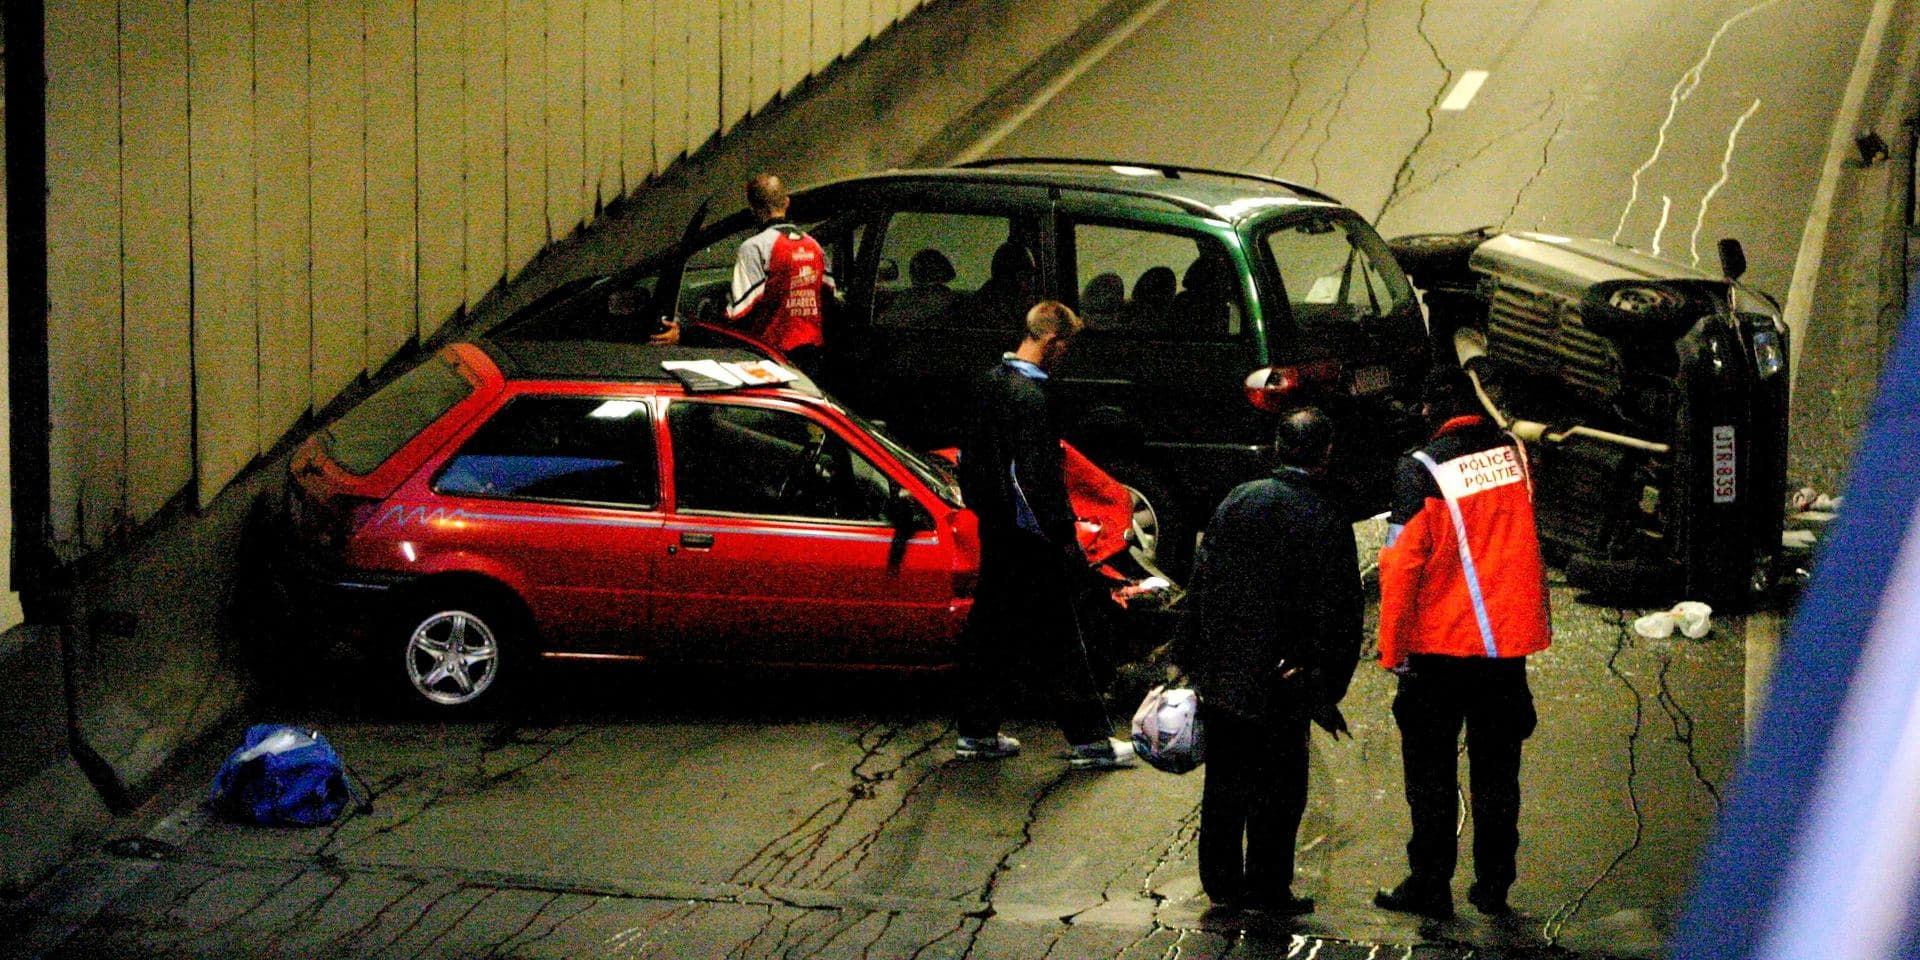 Le tunnel Rogier, le plus accidentogène de la capitale